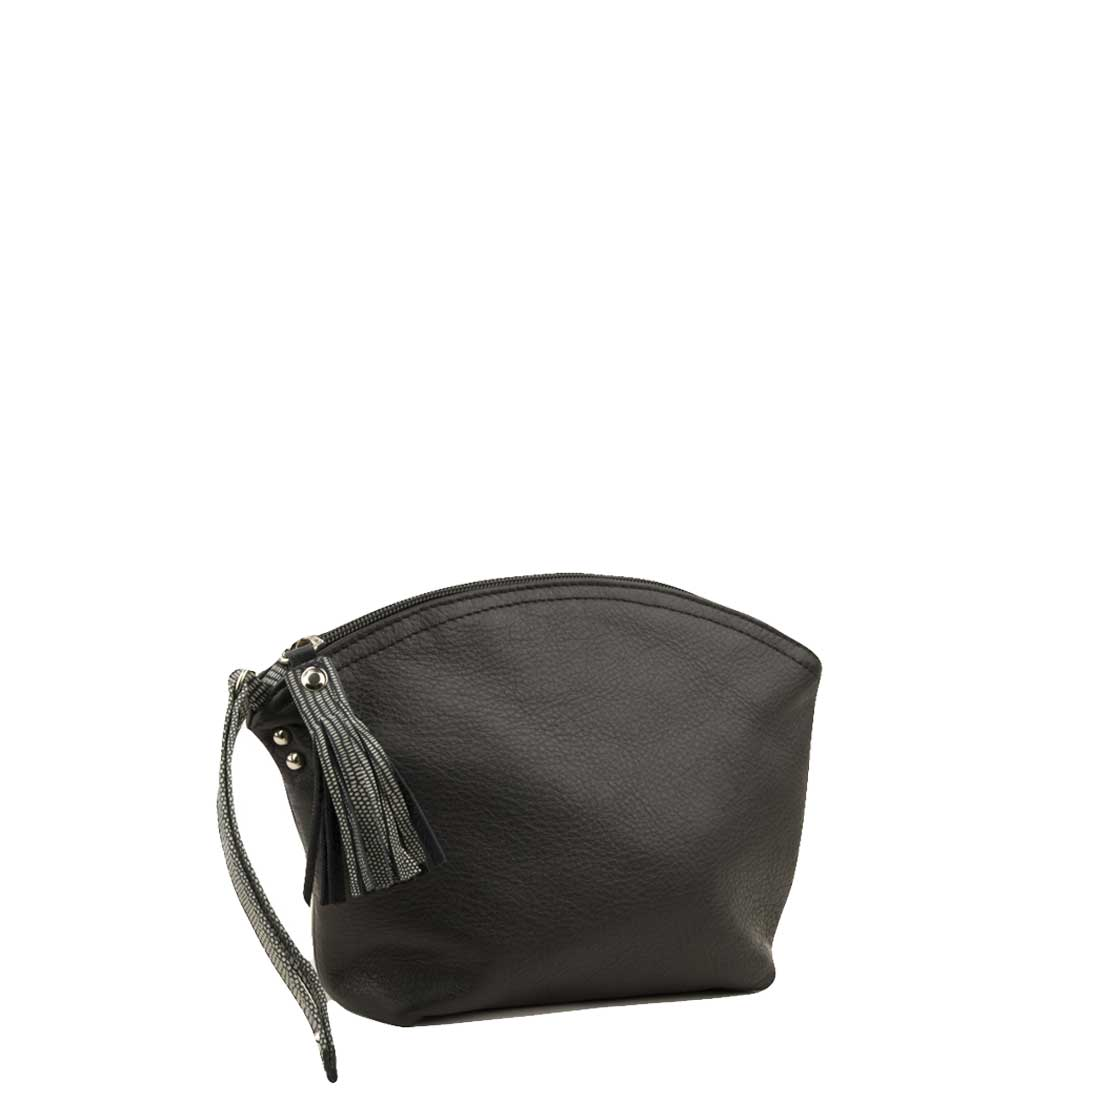 Wrist bag in black